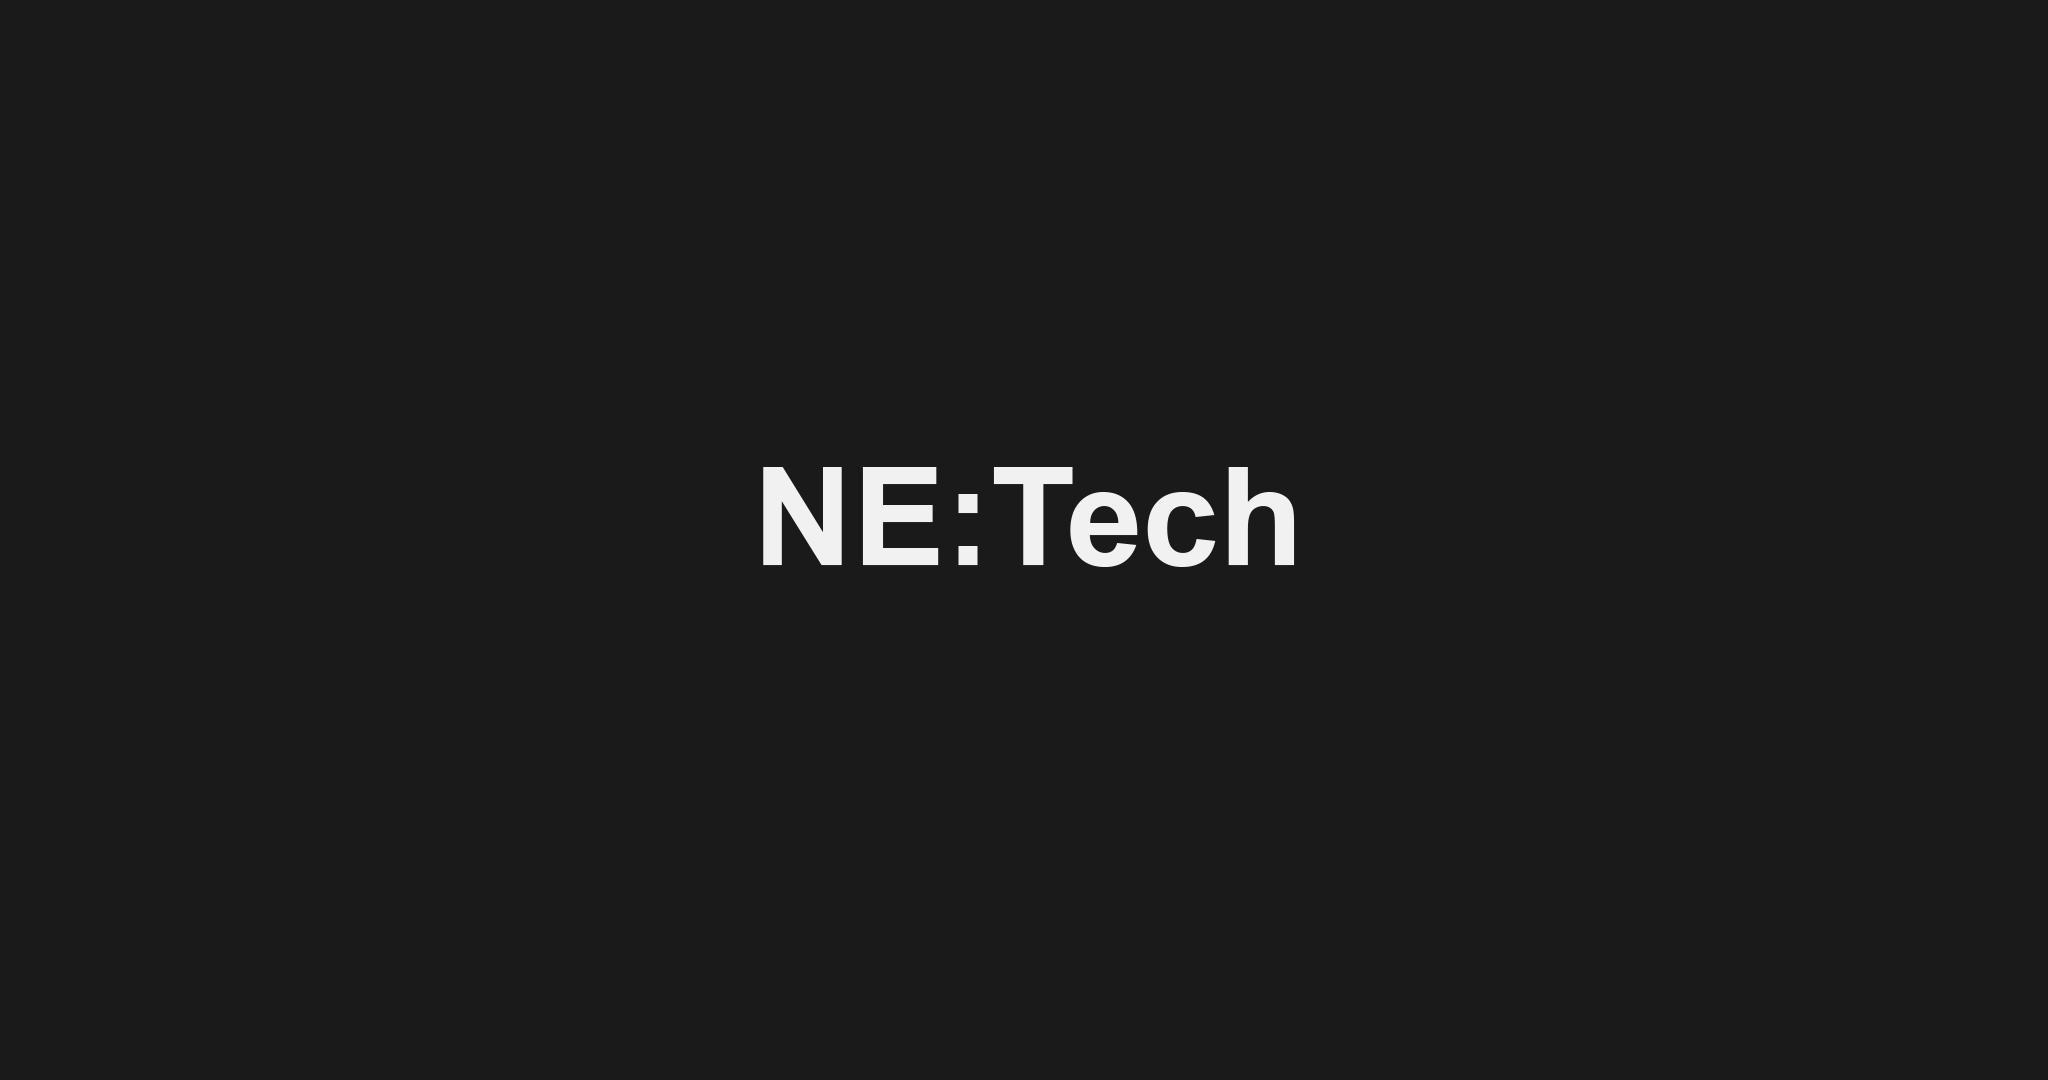 NE:Tech